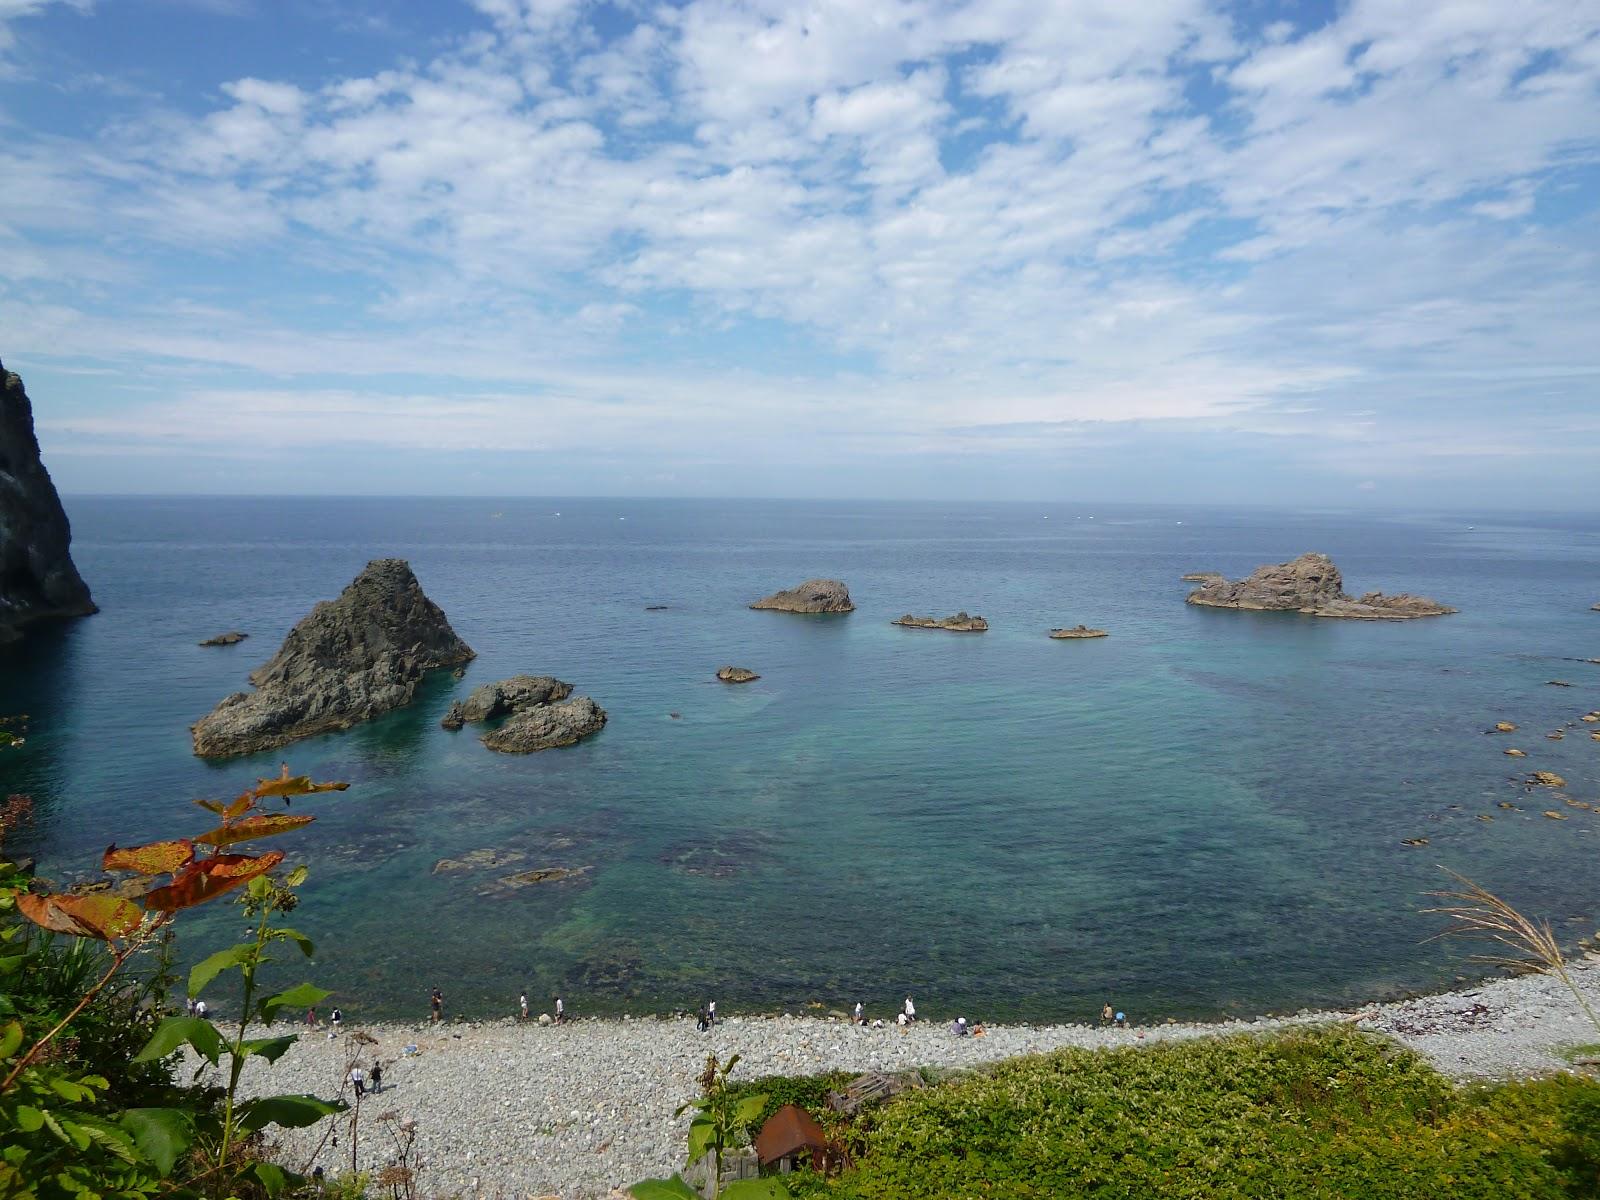 Viaje De Luna Shimamui Beach, Shakotan Peninsula -2995